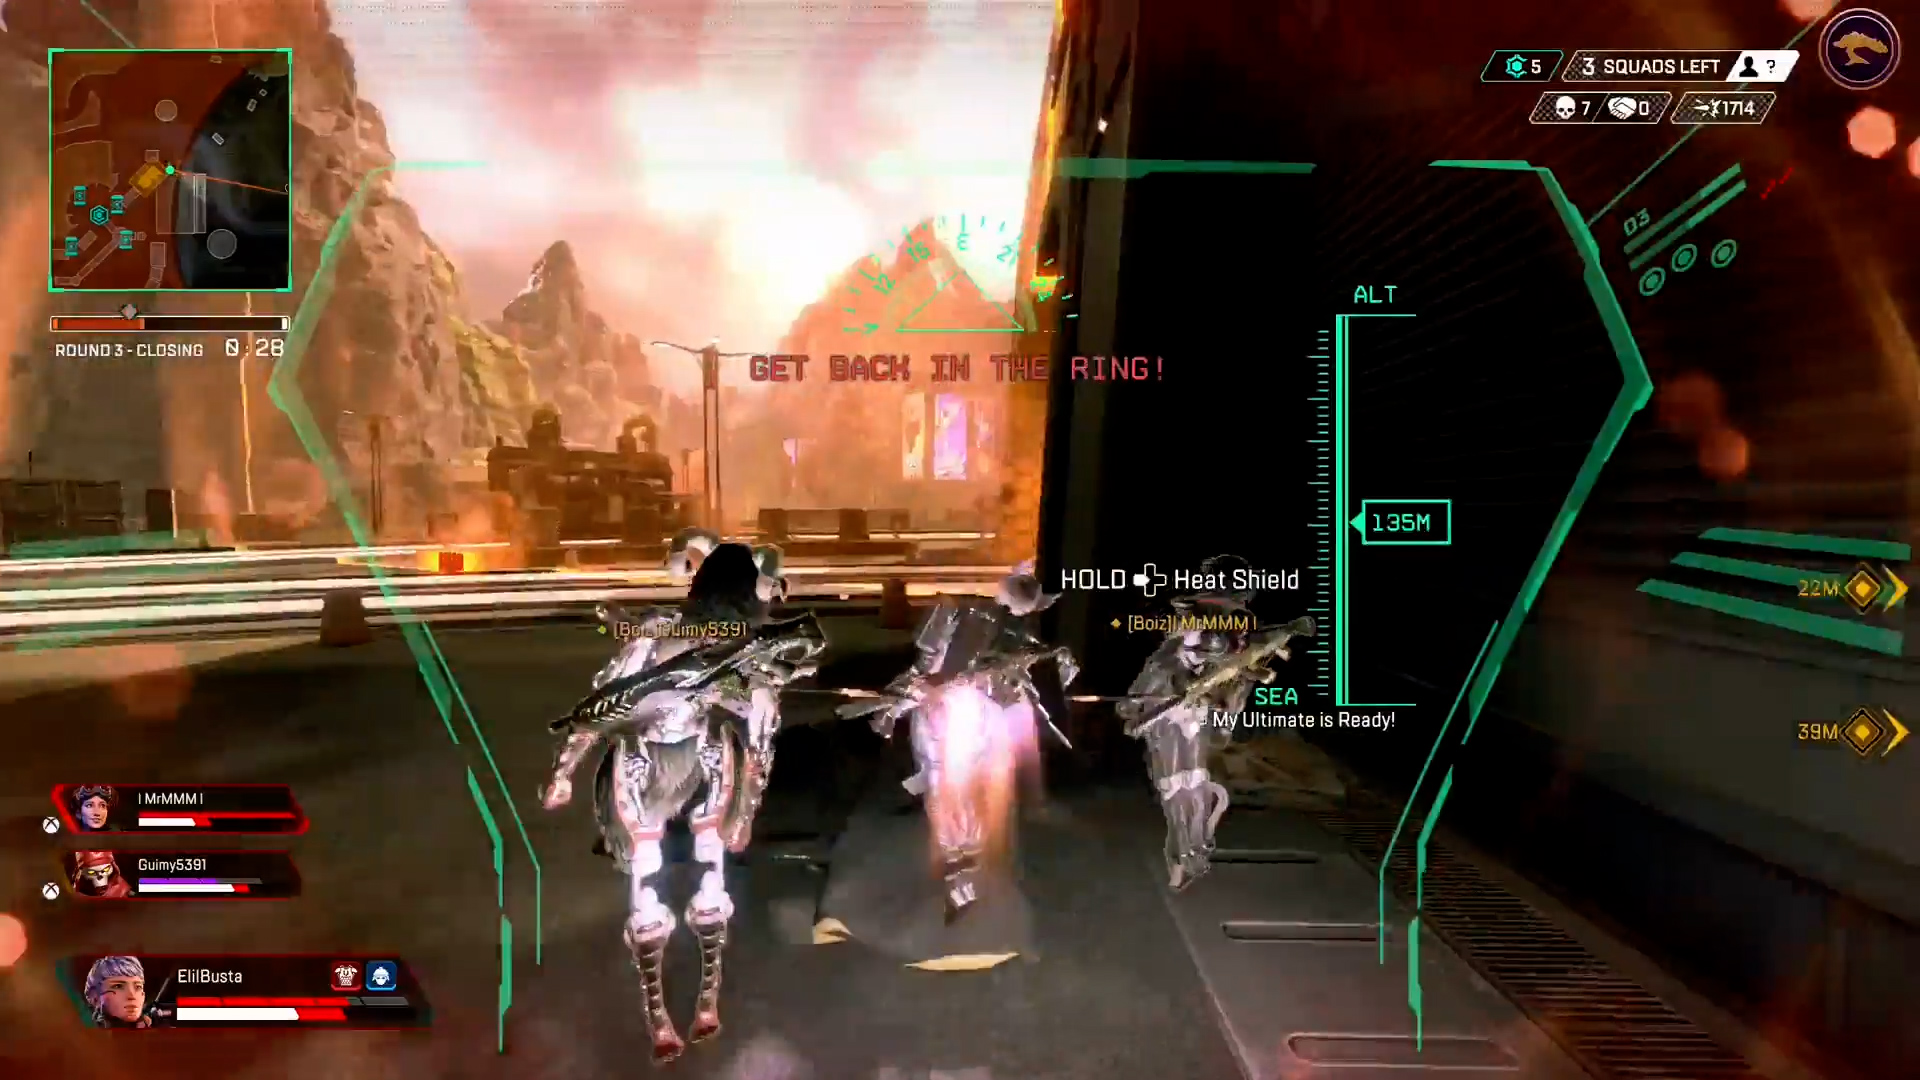 【APEX】こんな部隊壊滅は嫌だ「ヴァルキリーのアルティメットバグでリングダメージ死」